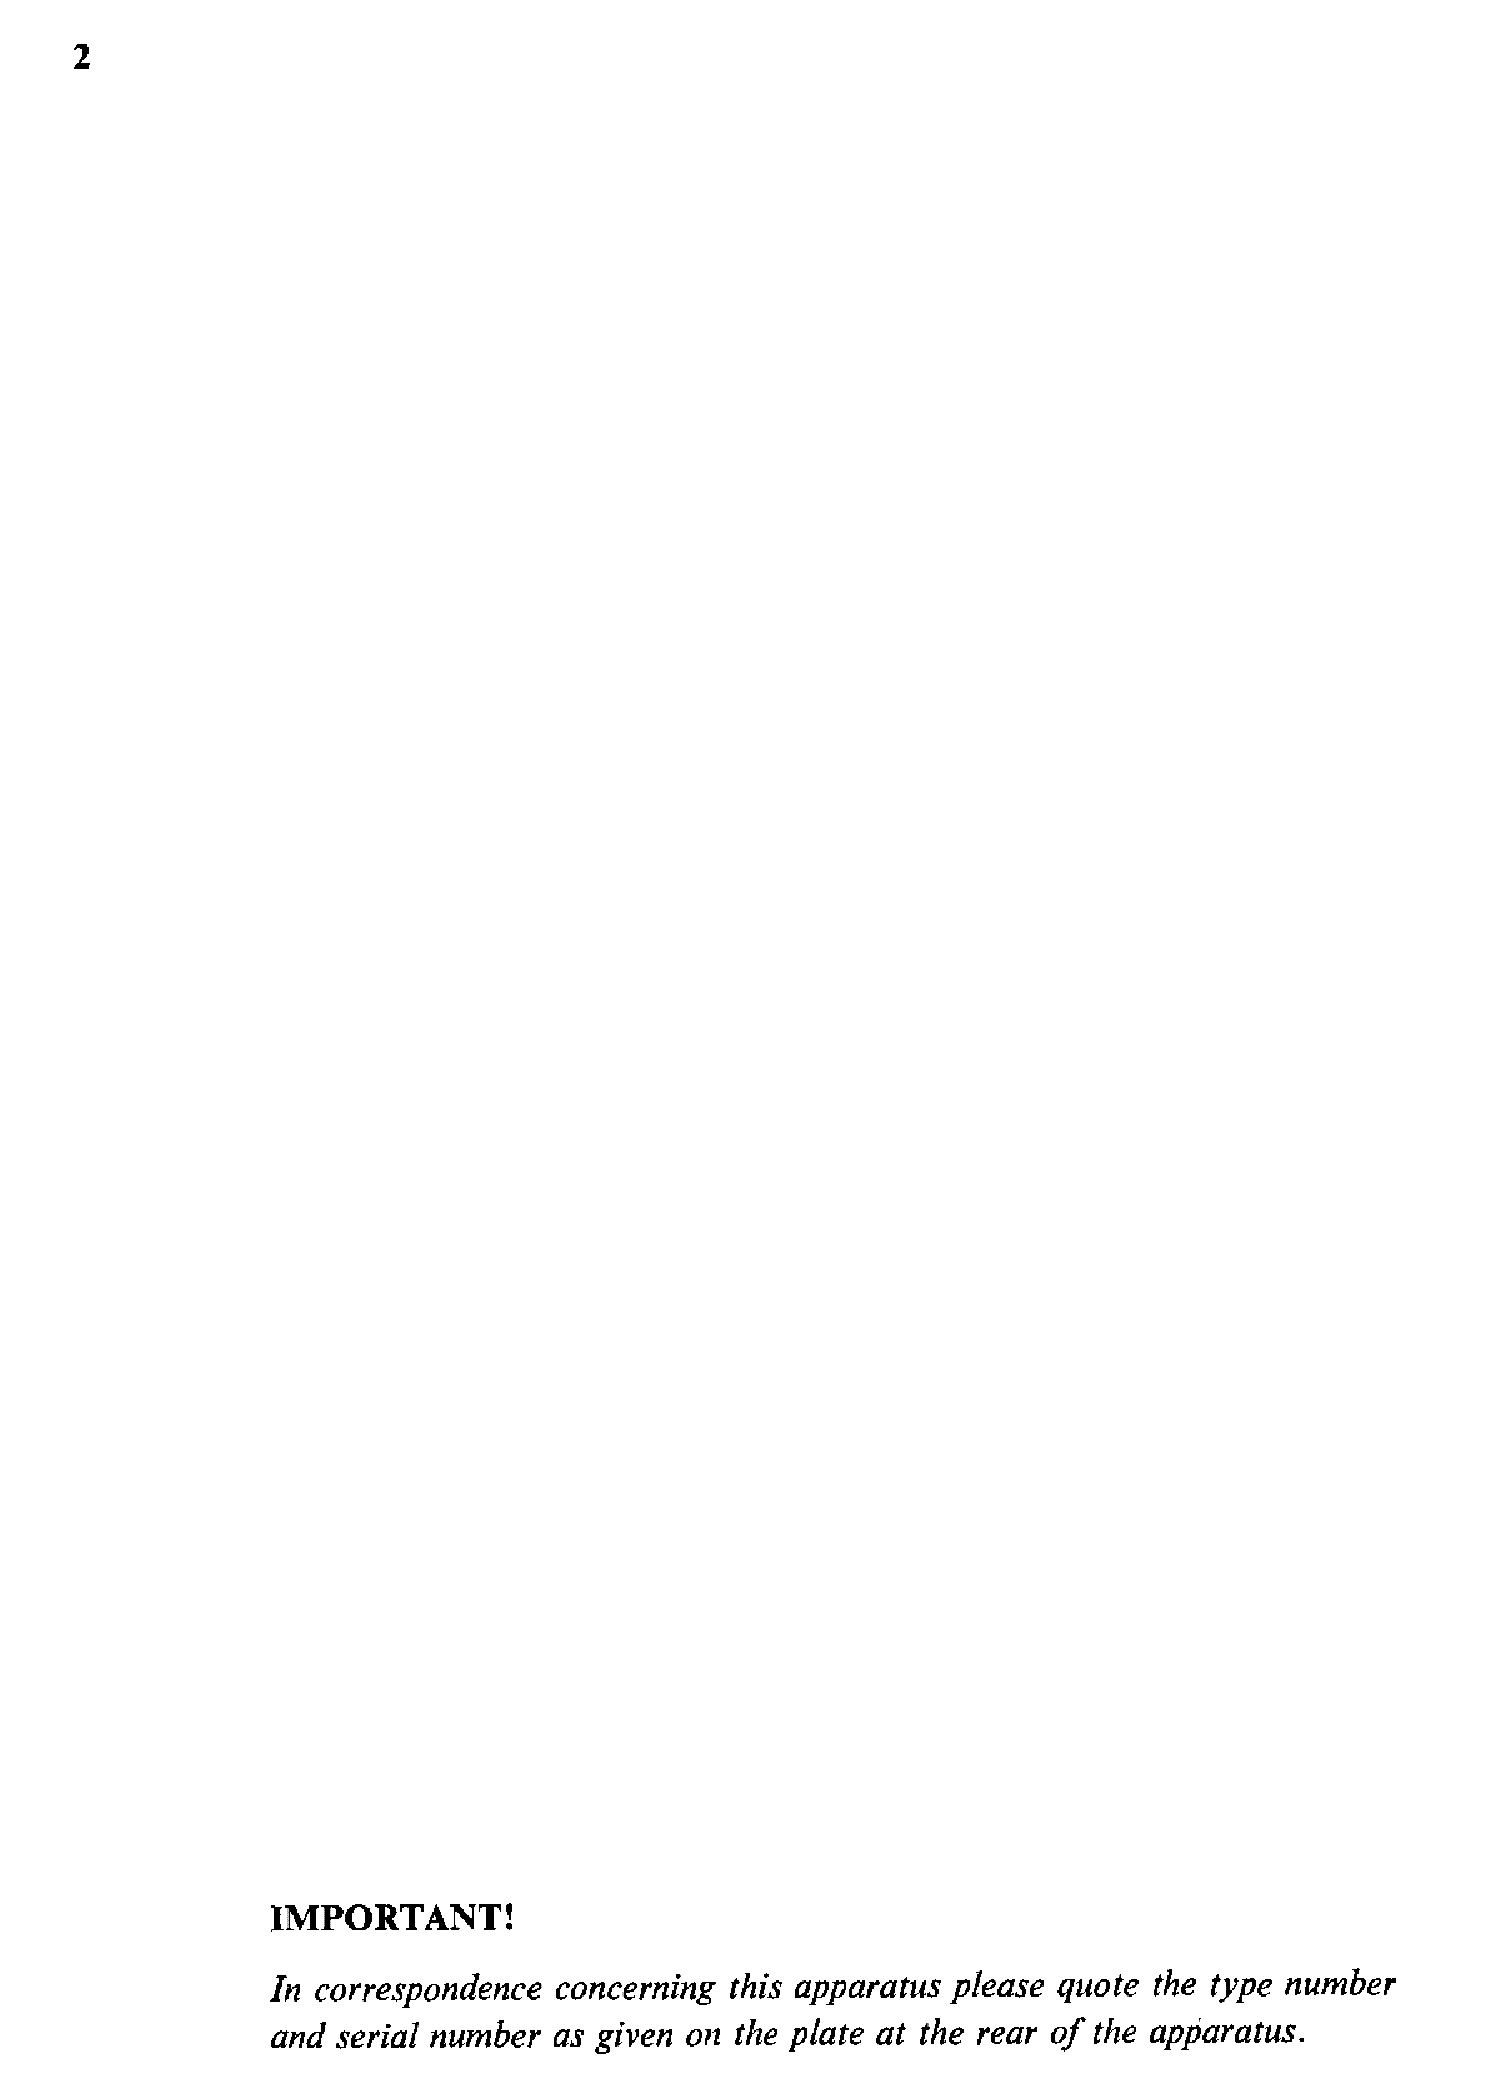 PHILIPS PM5321 0,15-108MHZ SIGNAL GENERATOR PEM191-DUMMY